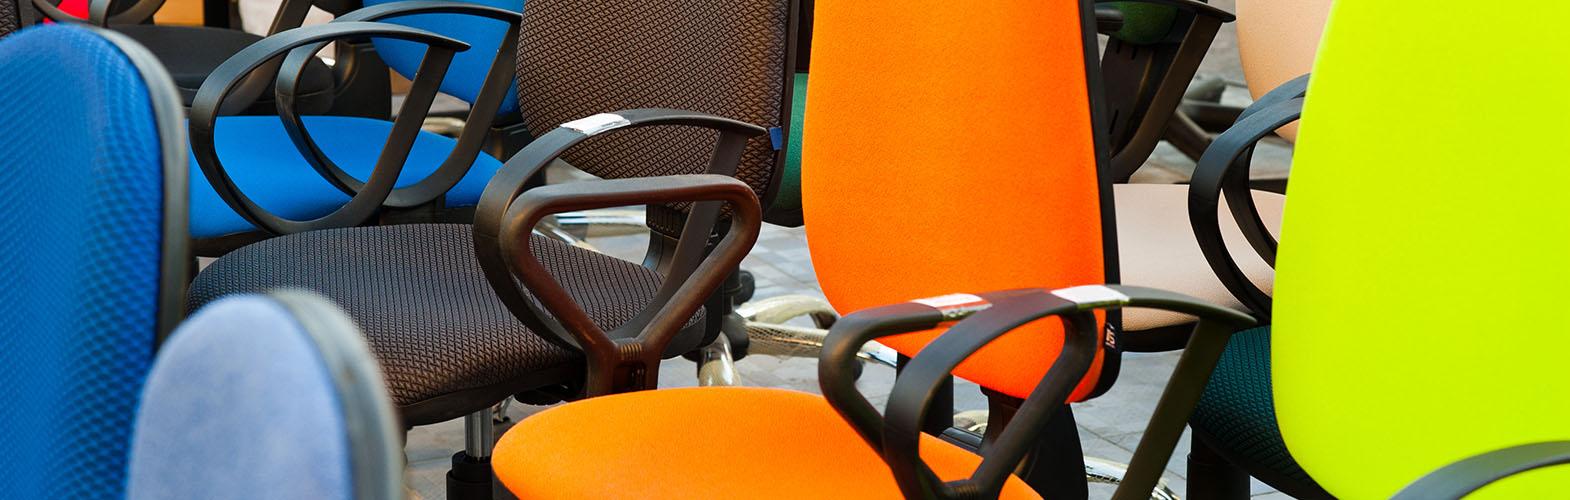 ergonomic furniture procurement